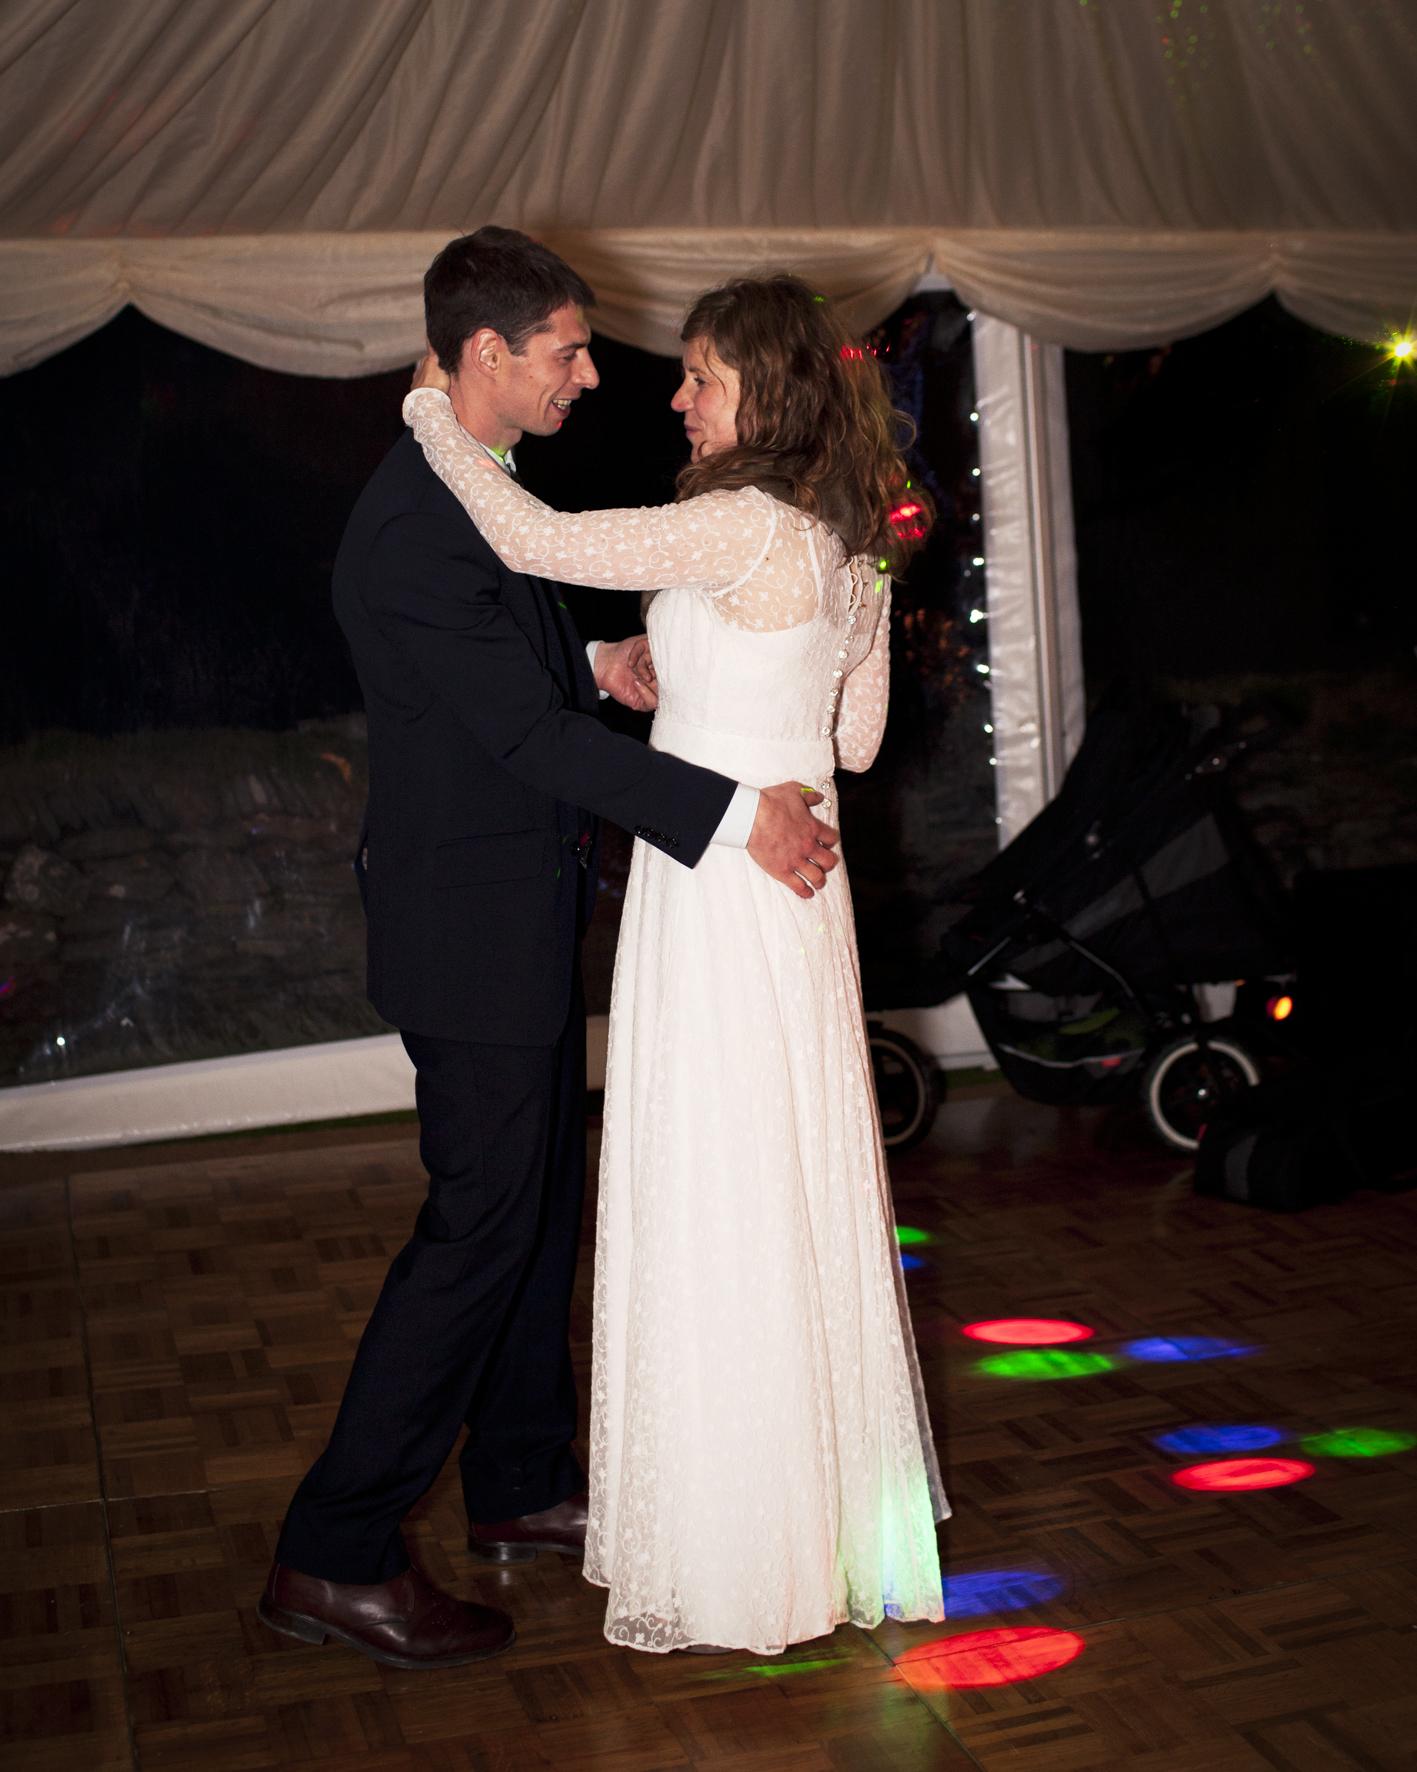 Wedding example_M&P__MG_4368-Edit_Claudia Leisinger.jpg